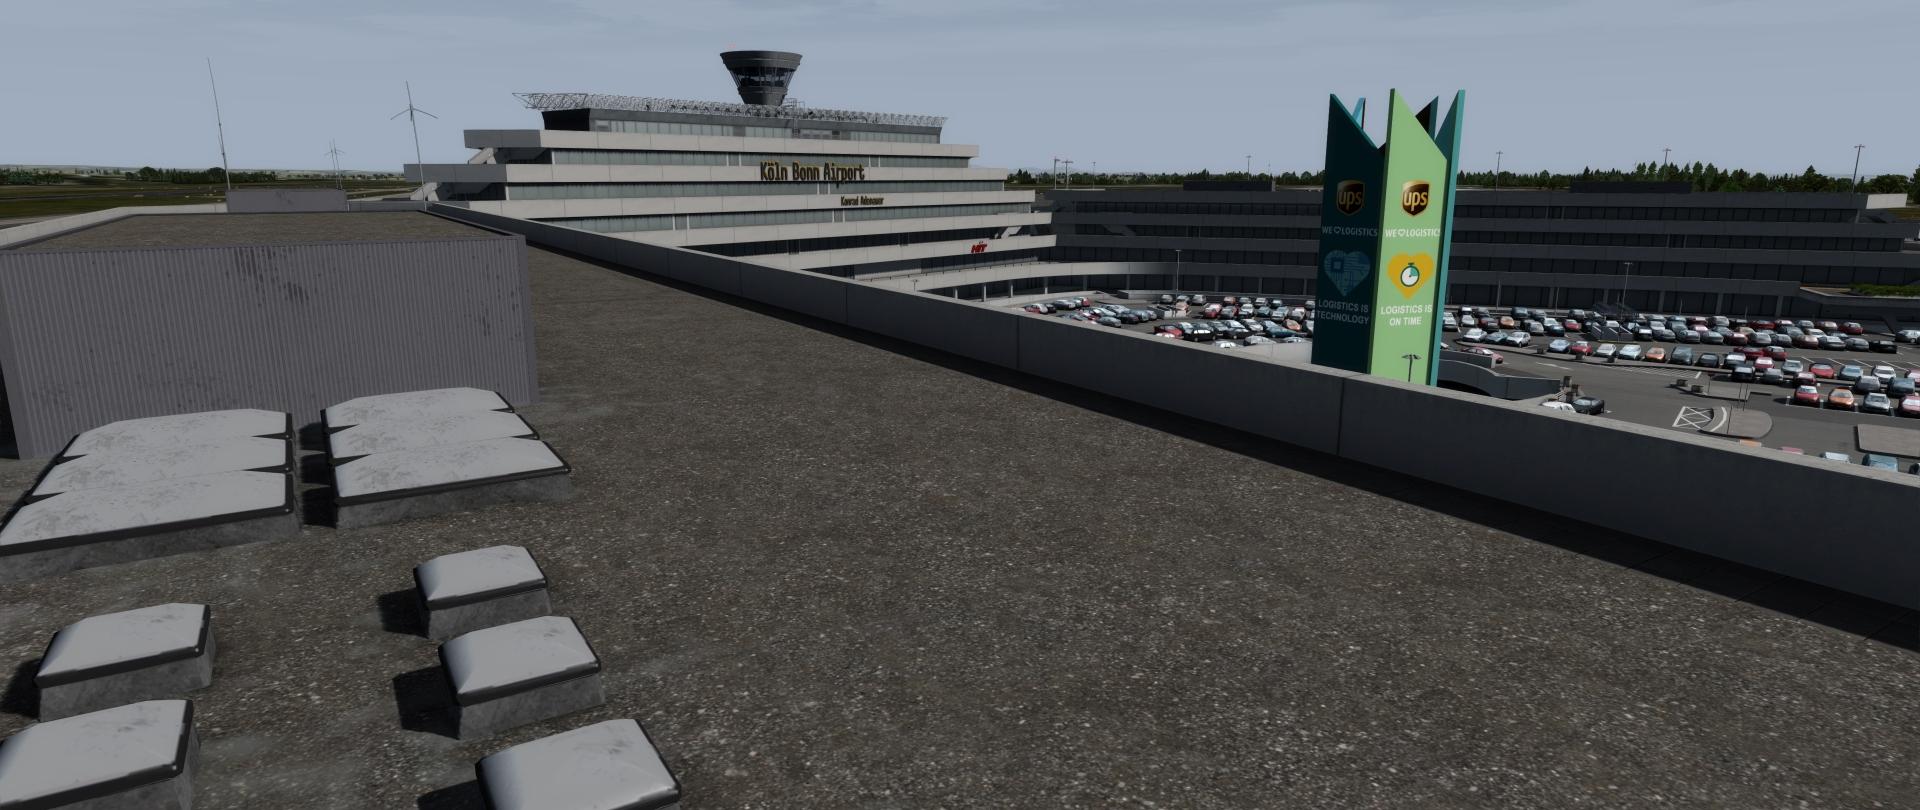 joerlendsund-aerosoft-cologne-eddk-image04